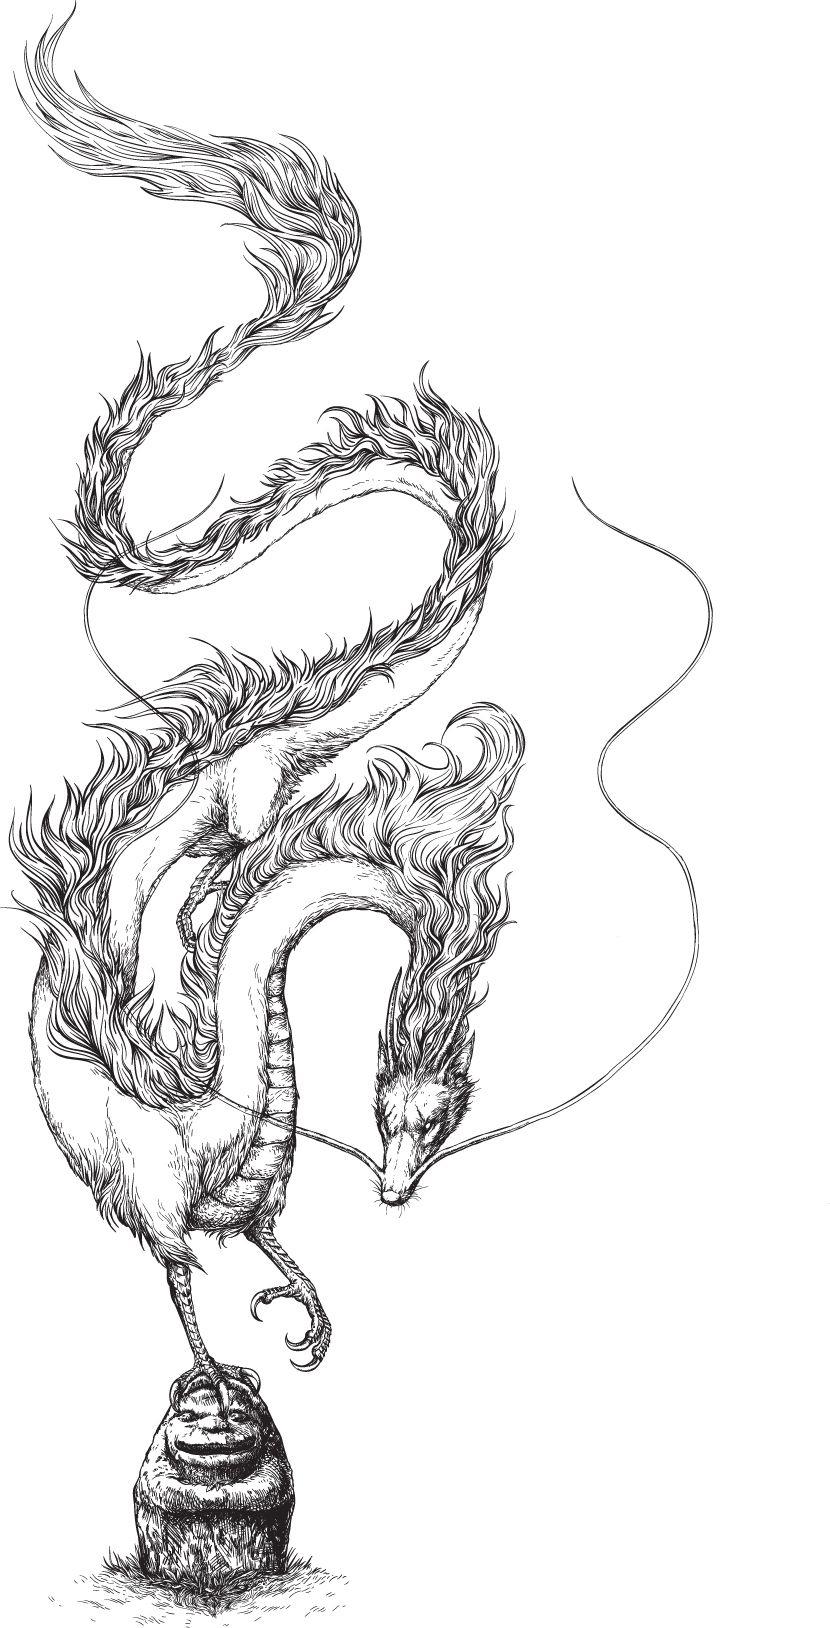 Tribute To Ghibli Spirited Away On Behance Tattoo Pinterest